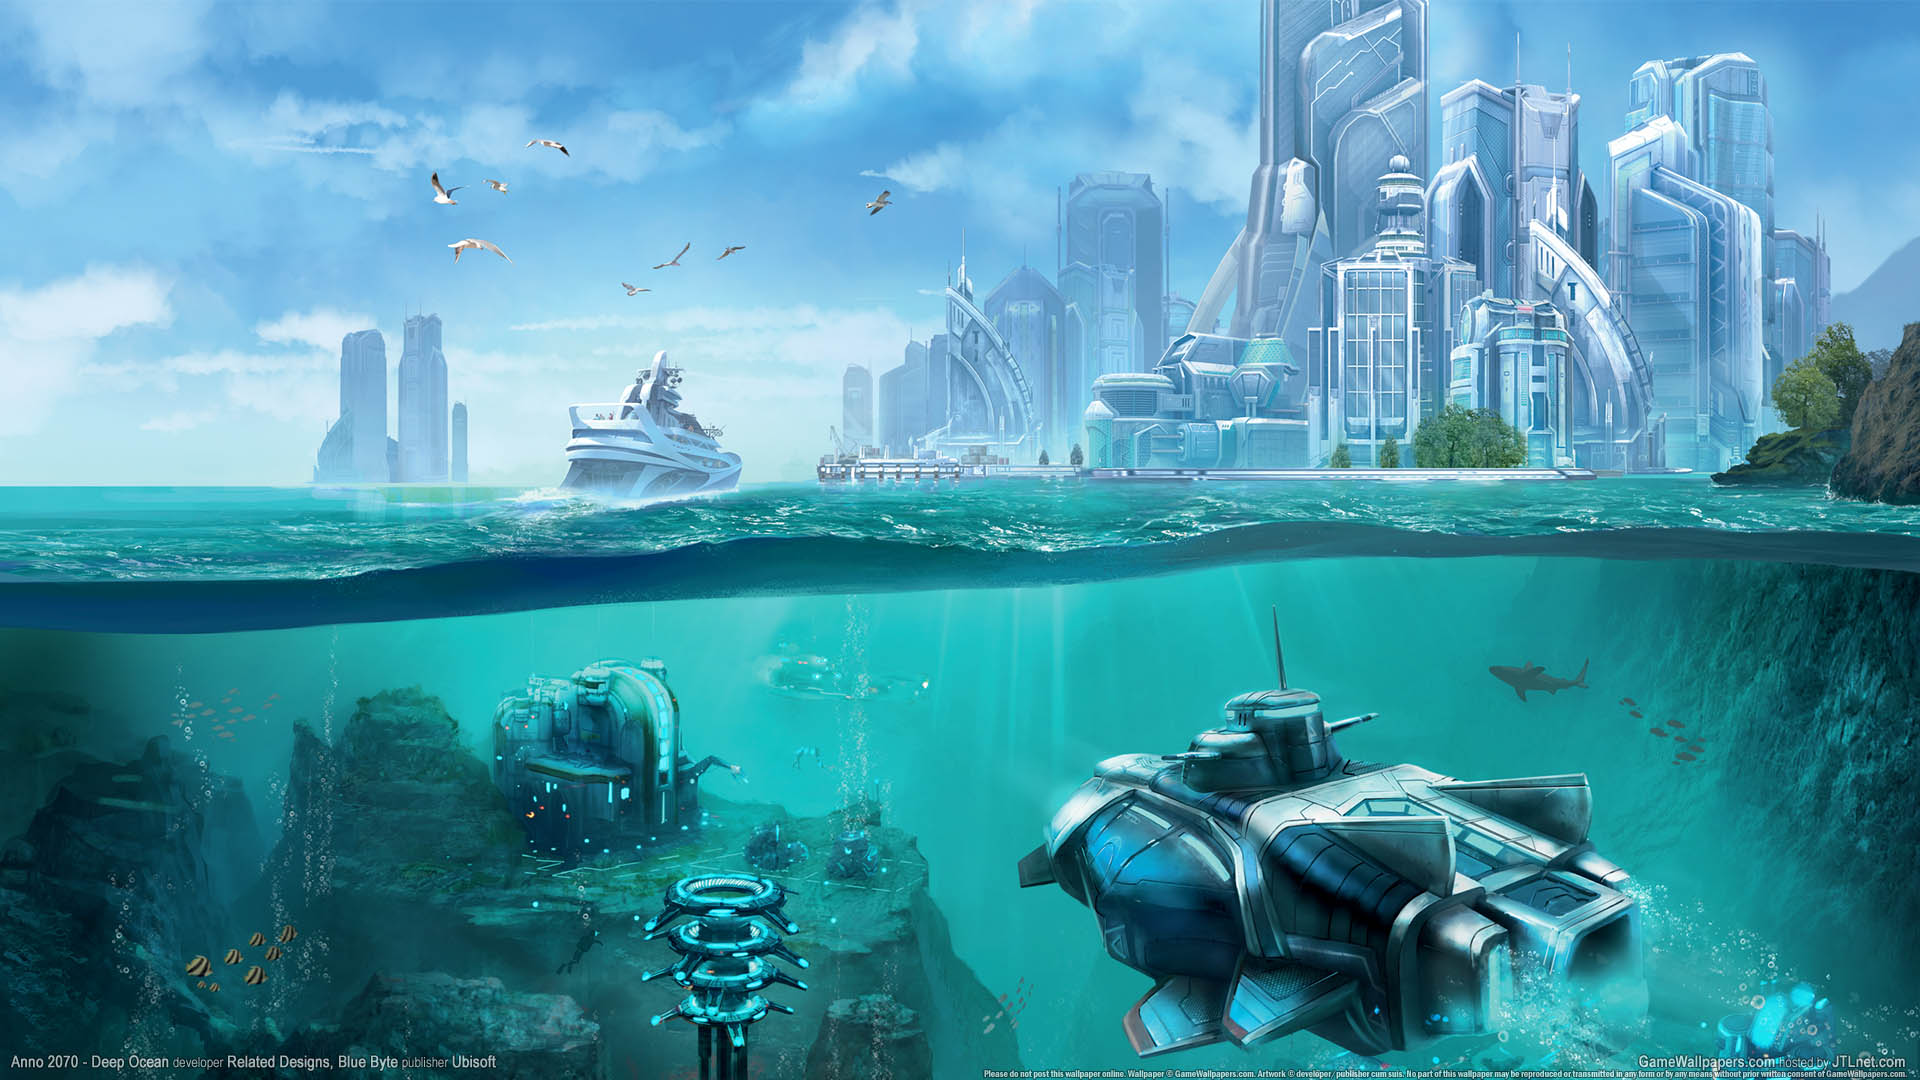 Anno 2070 - Deep Ocean Hintergrundbild 03 1920x1080